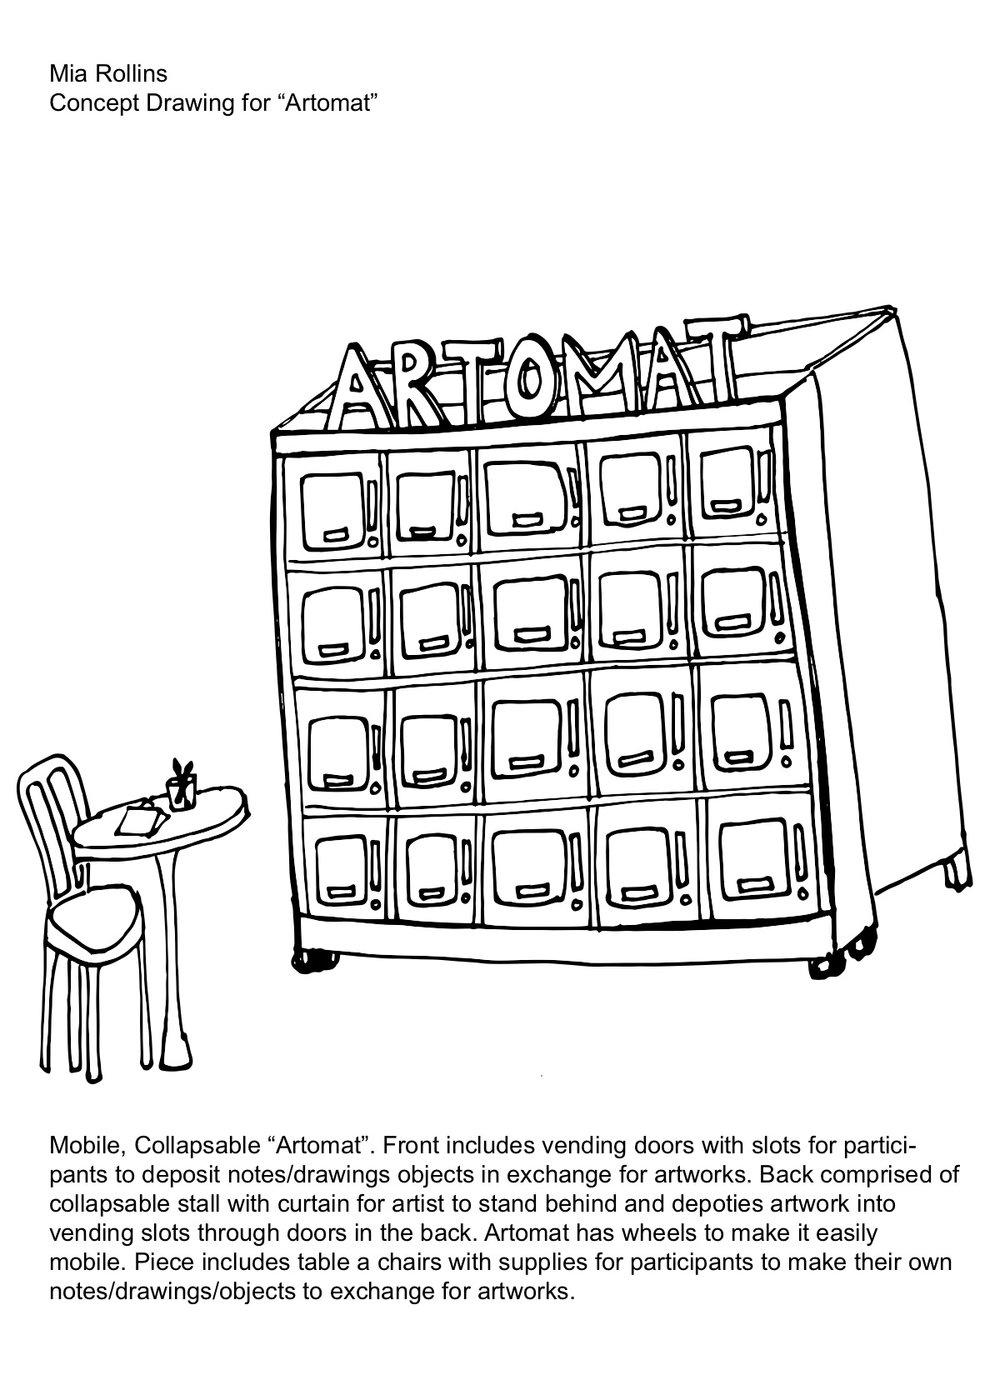 Rollins Artomat Concept Drawing.jpg